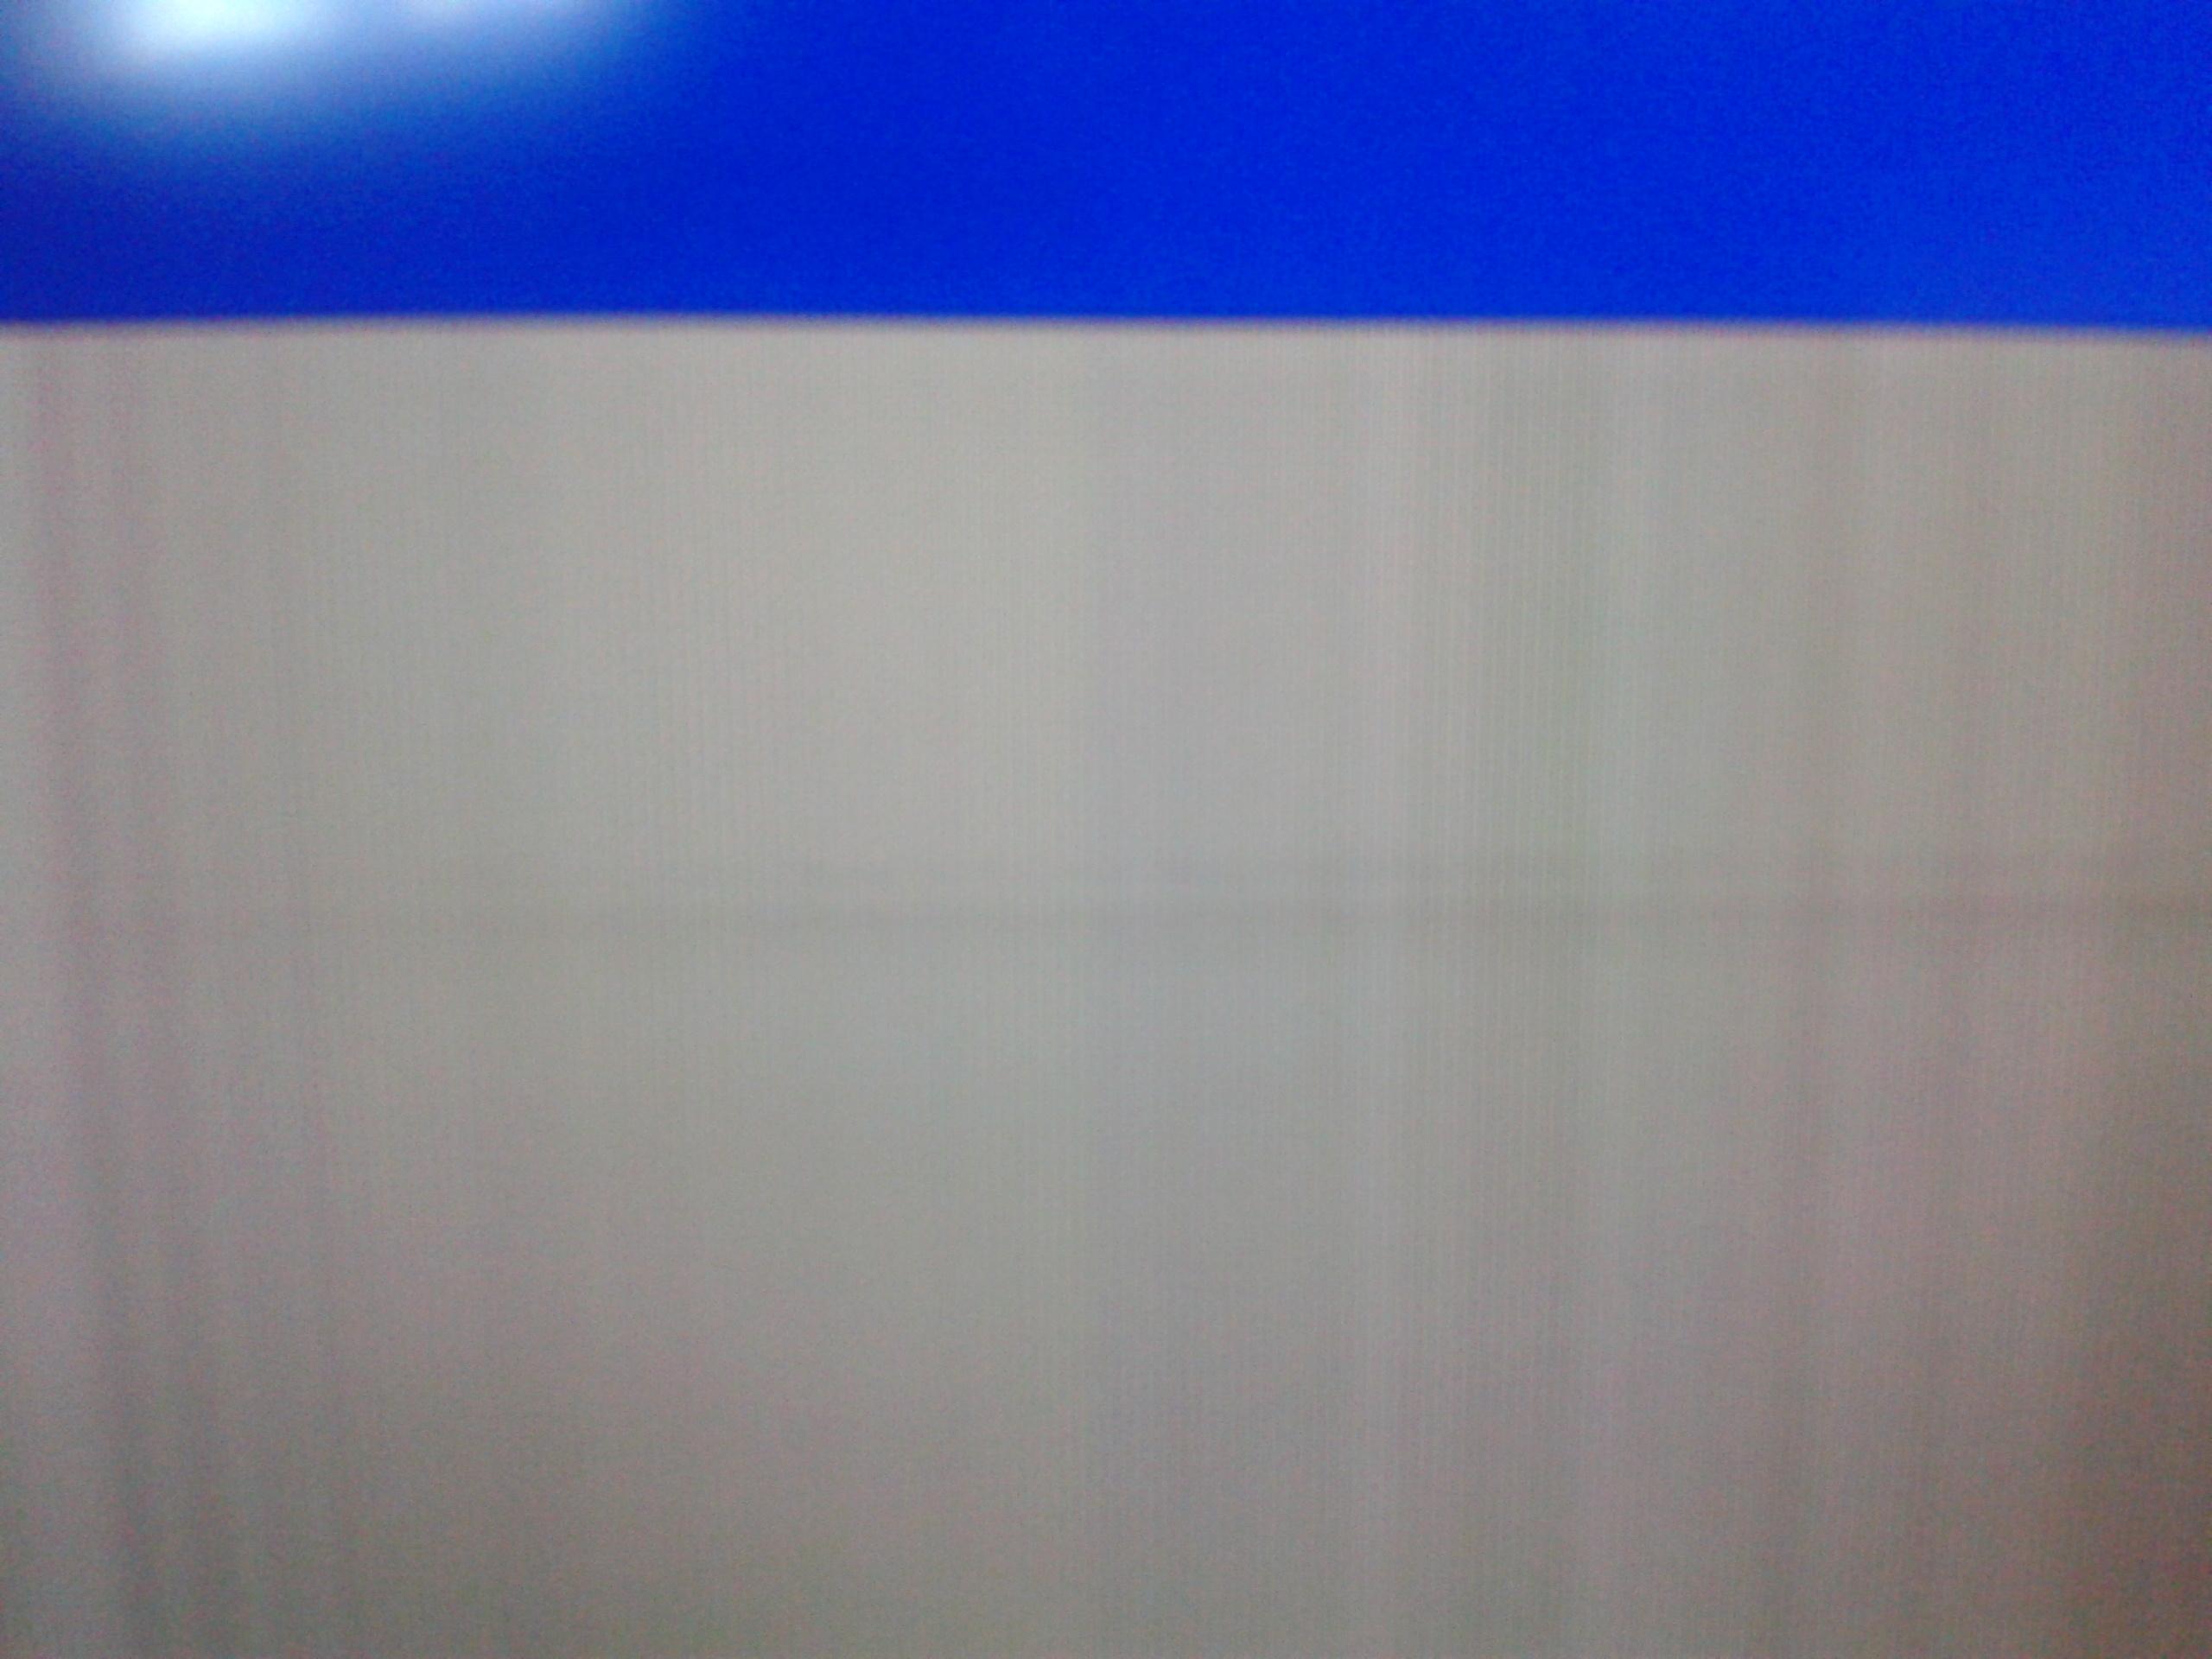 Telewizor Philips 47PFL5604H/12 paski na cz�ci ekranu a wadliwy inwerter